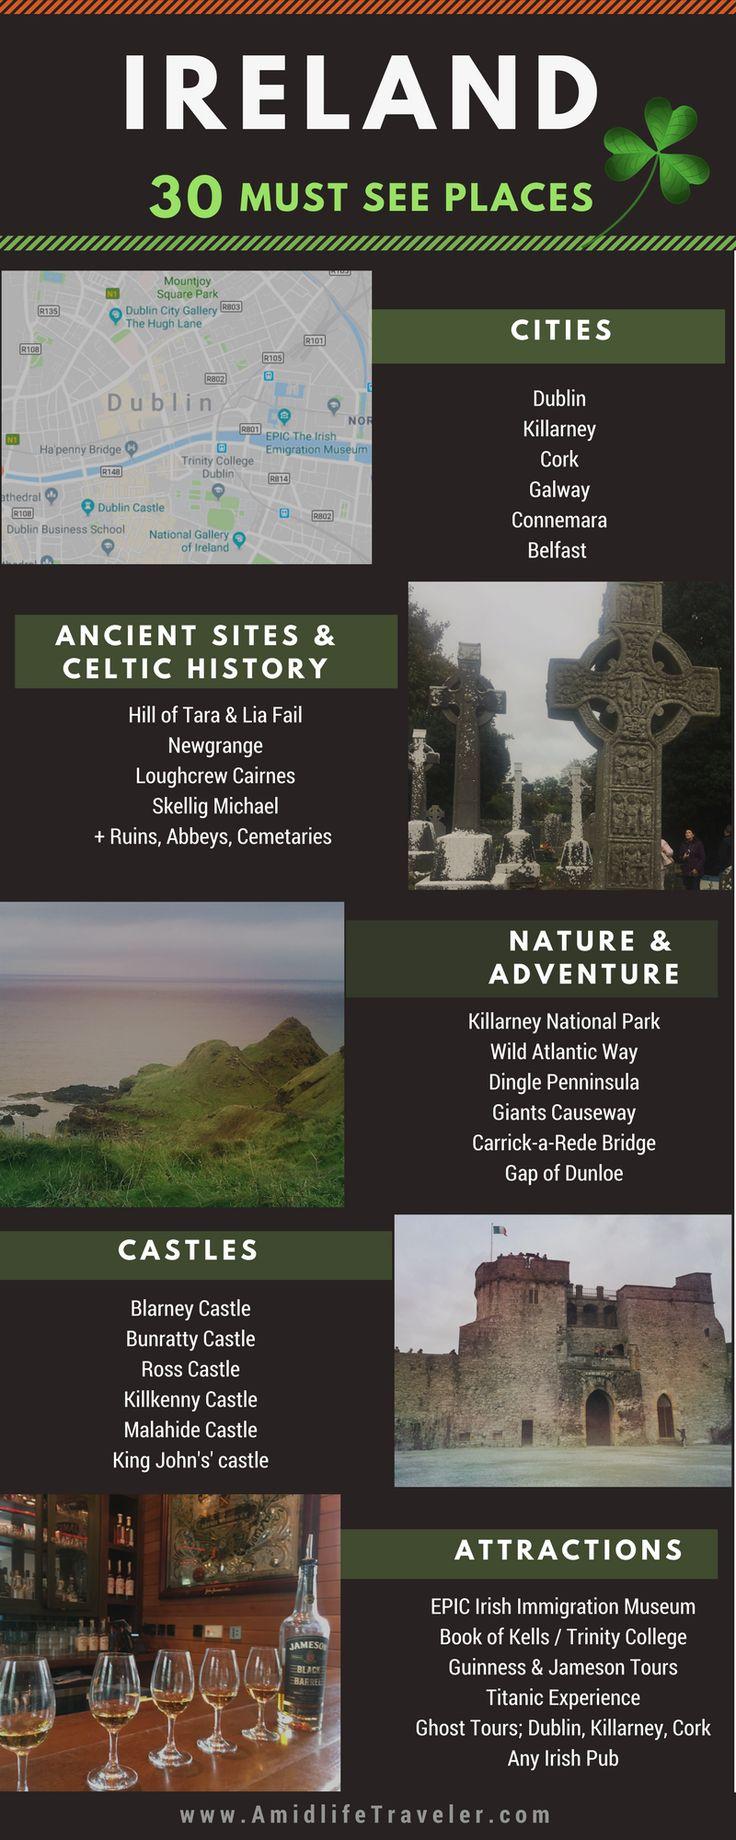 Ireland Vacation Ideas